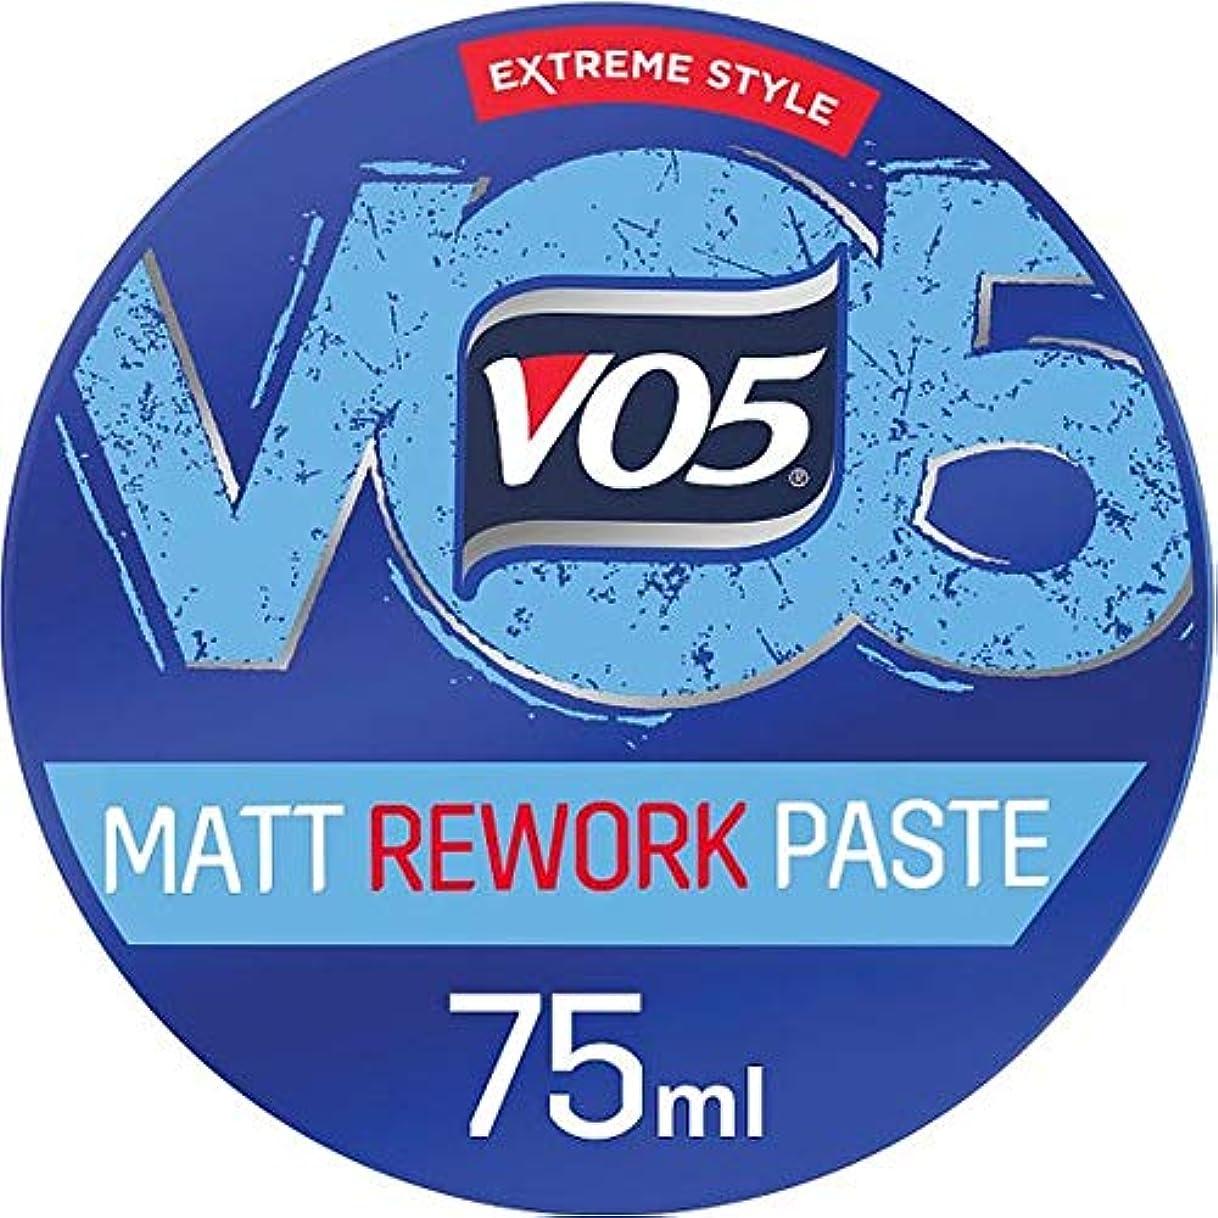 [Vo5] Vo5極端なスタイルマットリワークペースト75ミリリットル - Vo5 Extreme Style Matte Rework Paste 75Ml [並行輸入品]